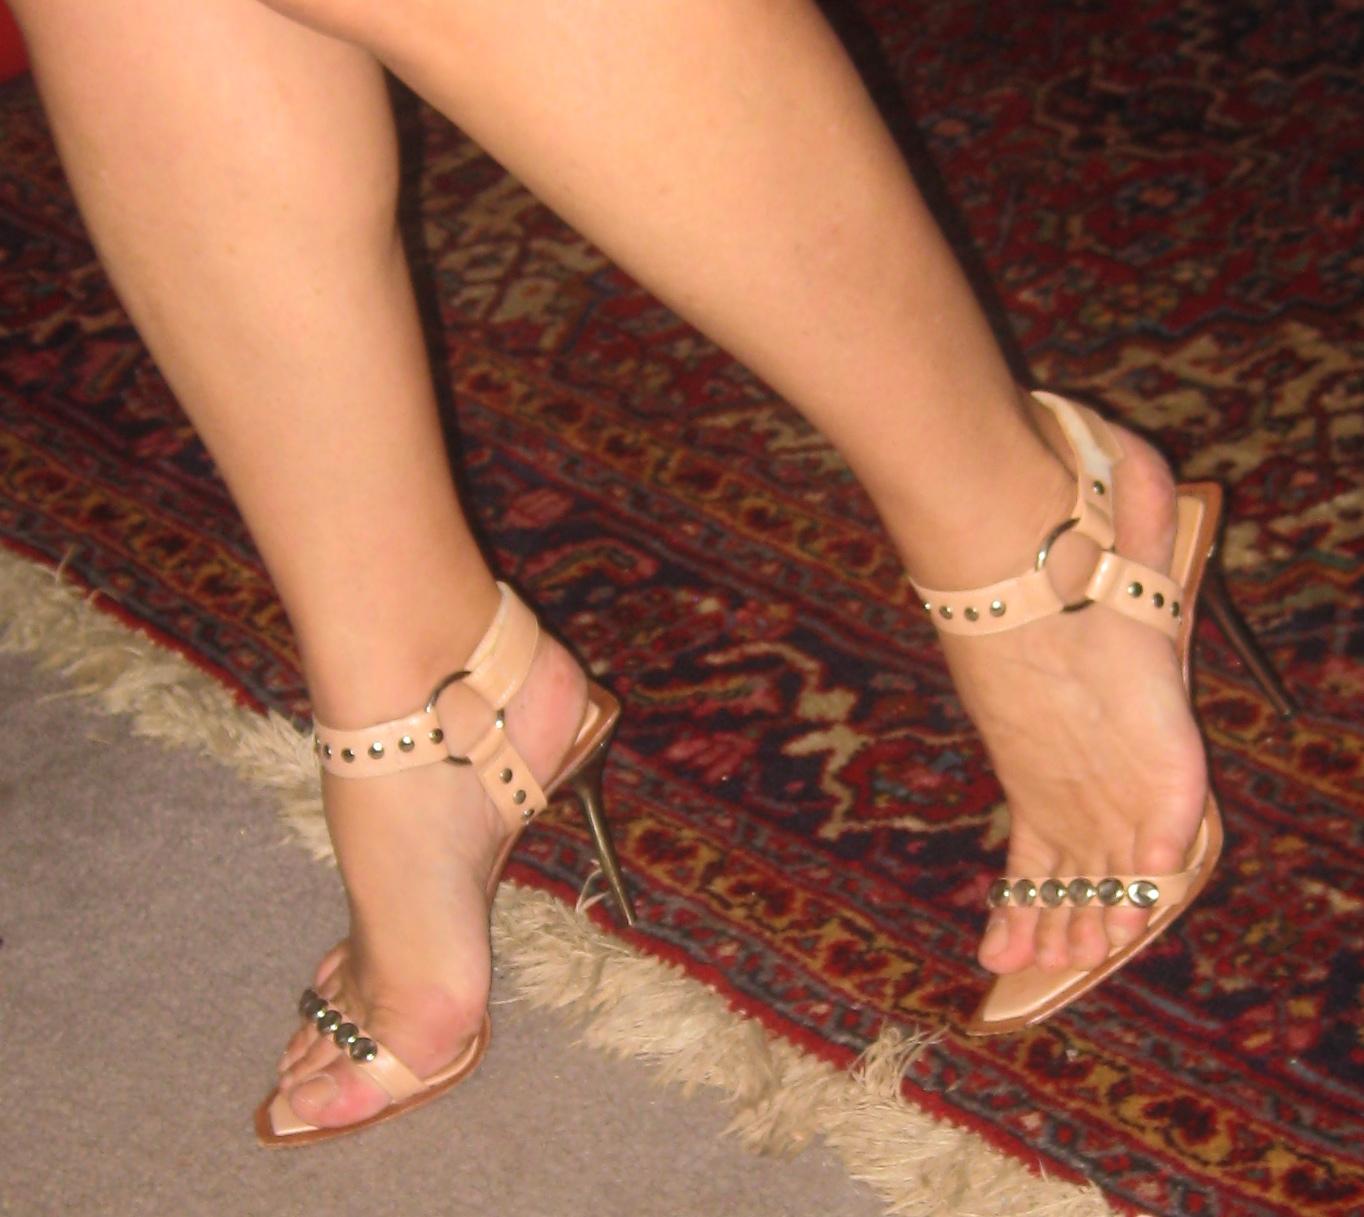 Lick silk stockings high heeled